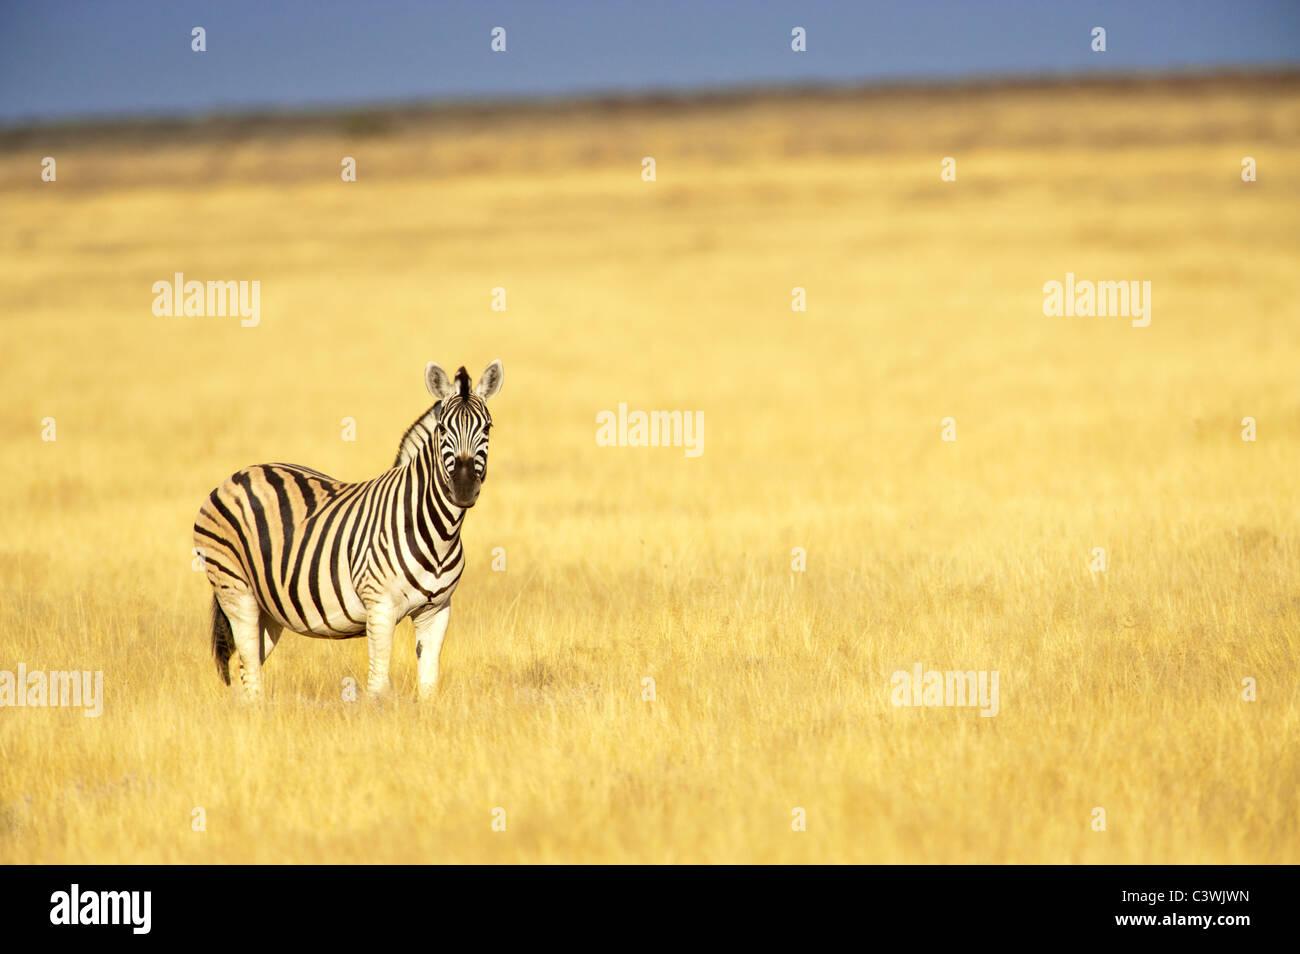 zebra desert savanna savannah burchell burchelli equus namibia damaraland 1 one single space for text layout golden - Stock Image